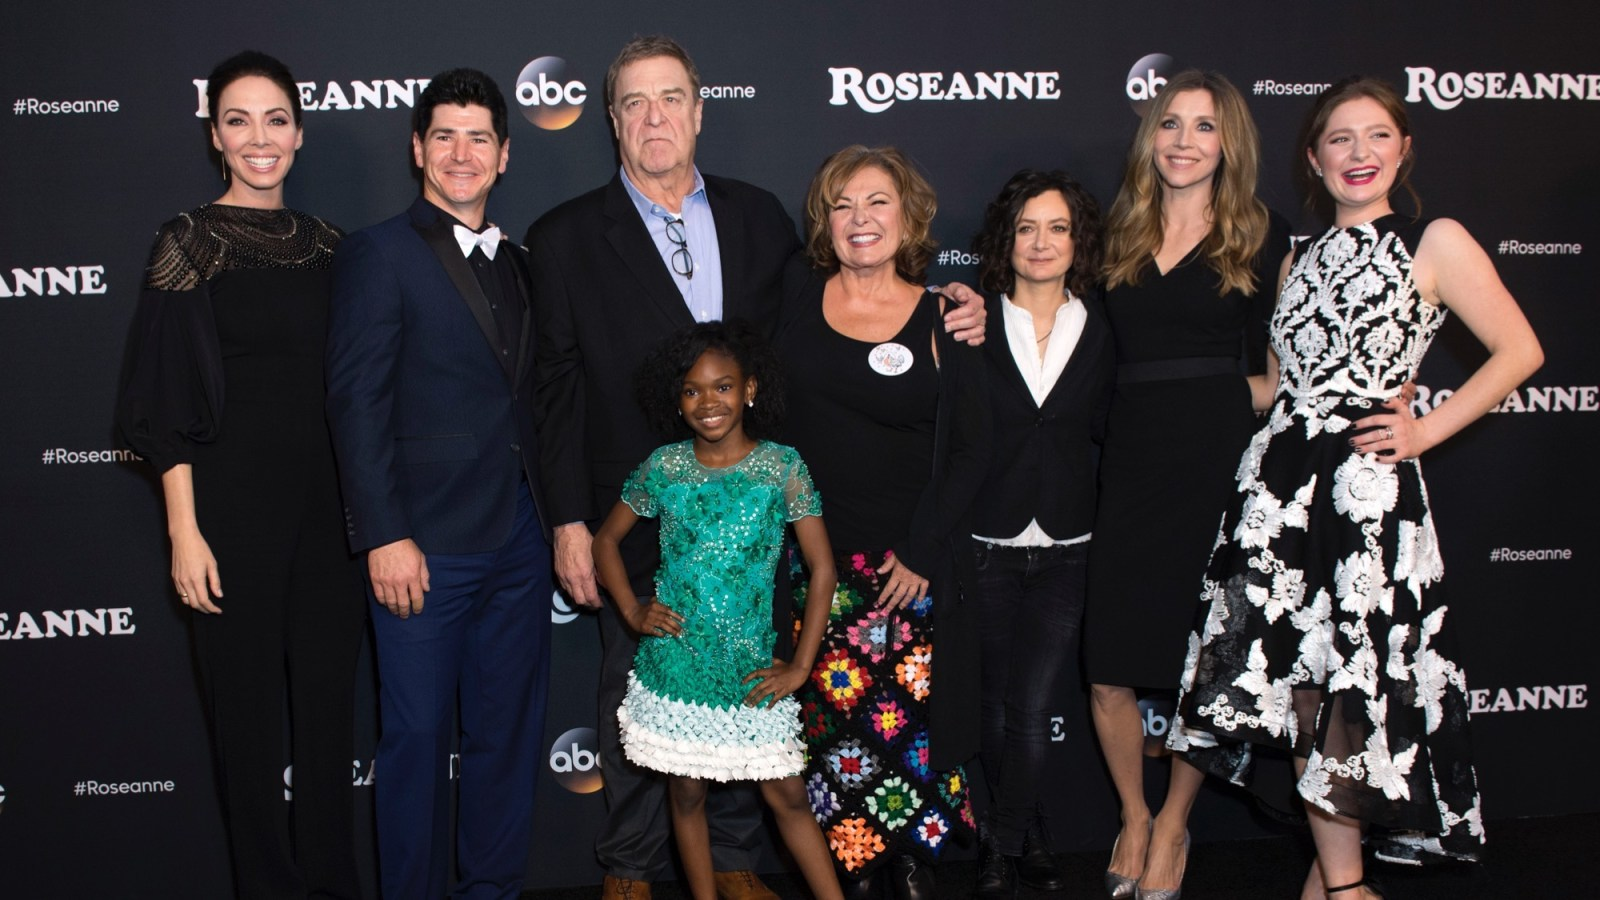 Roseanne ENTERTAINMENT-US-TELEVISION-ROSEANNE